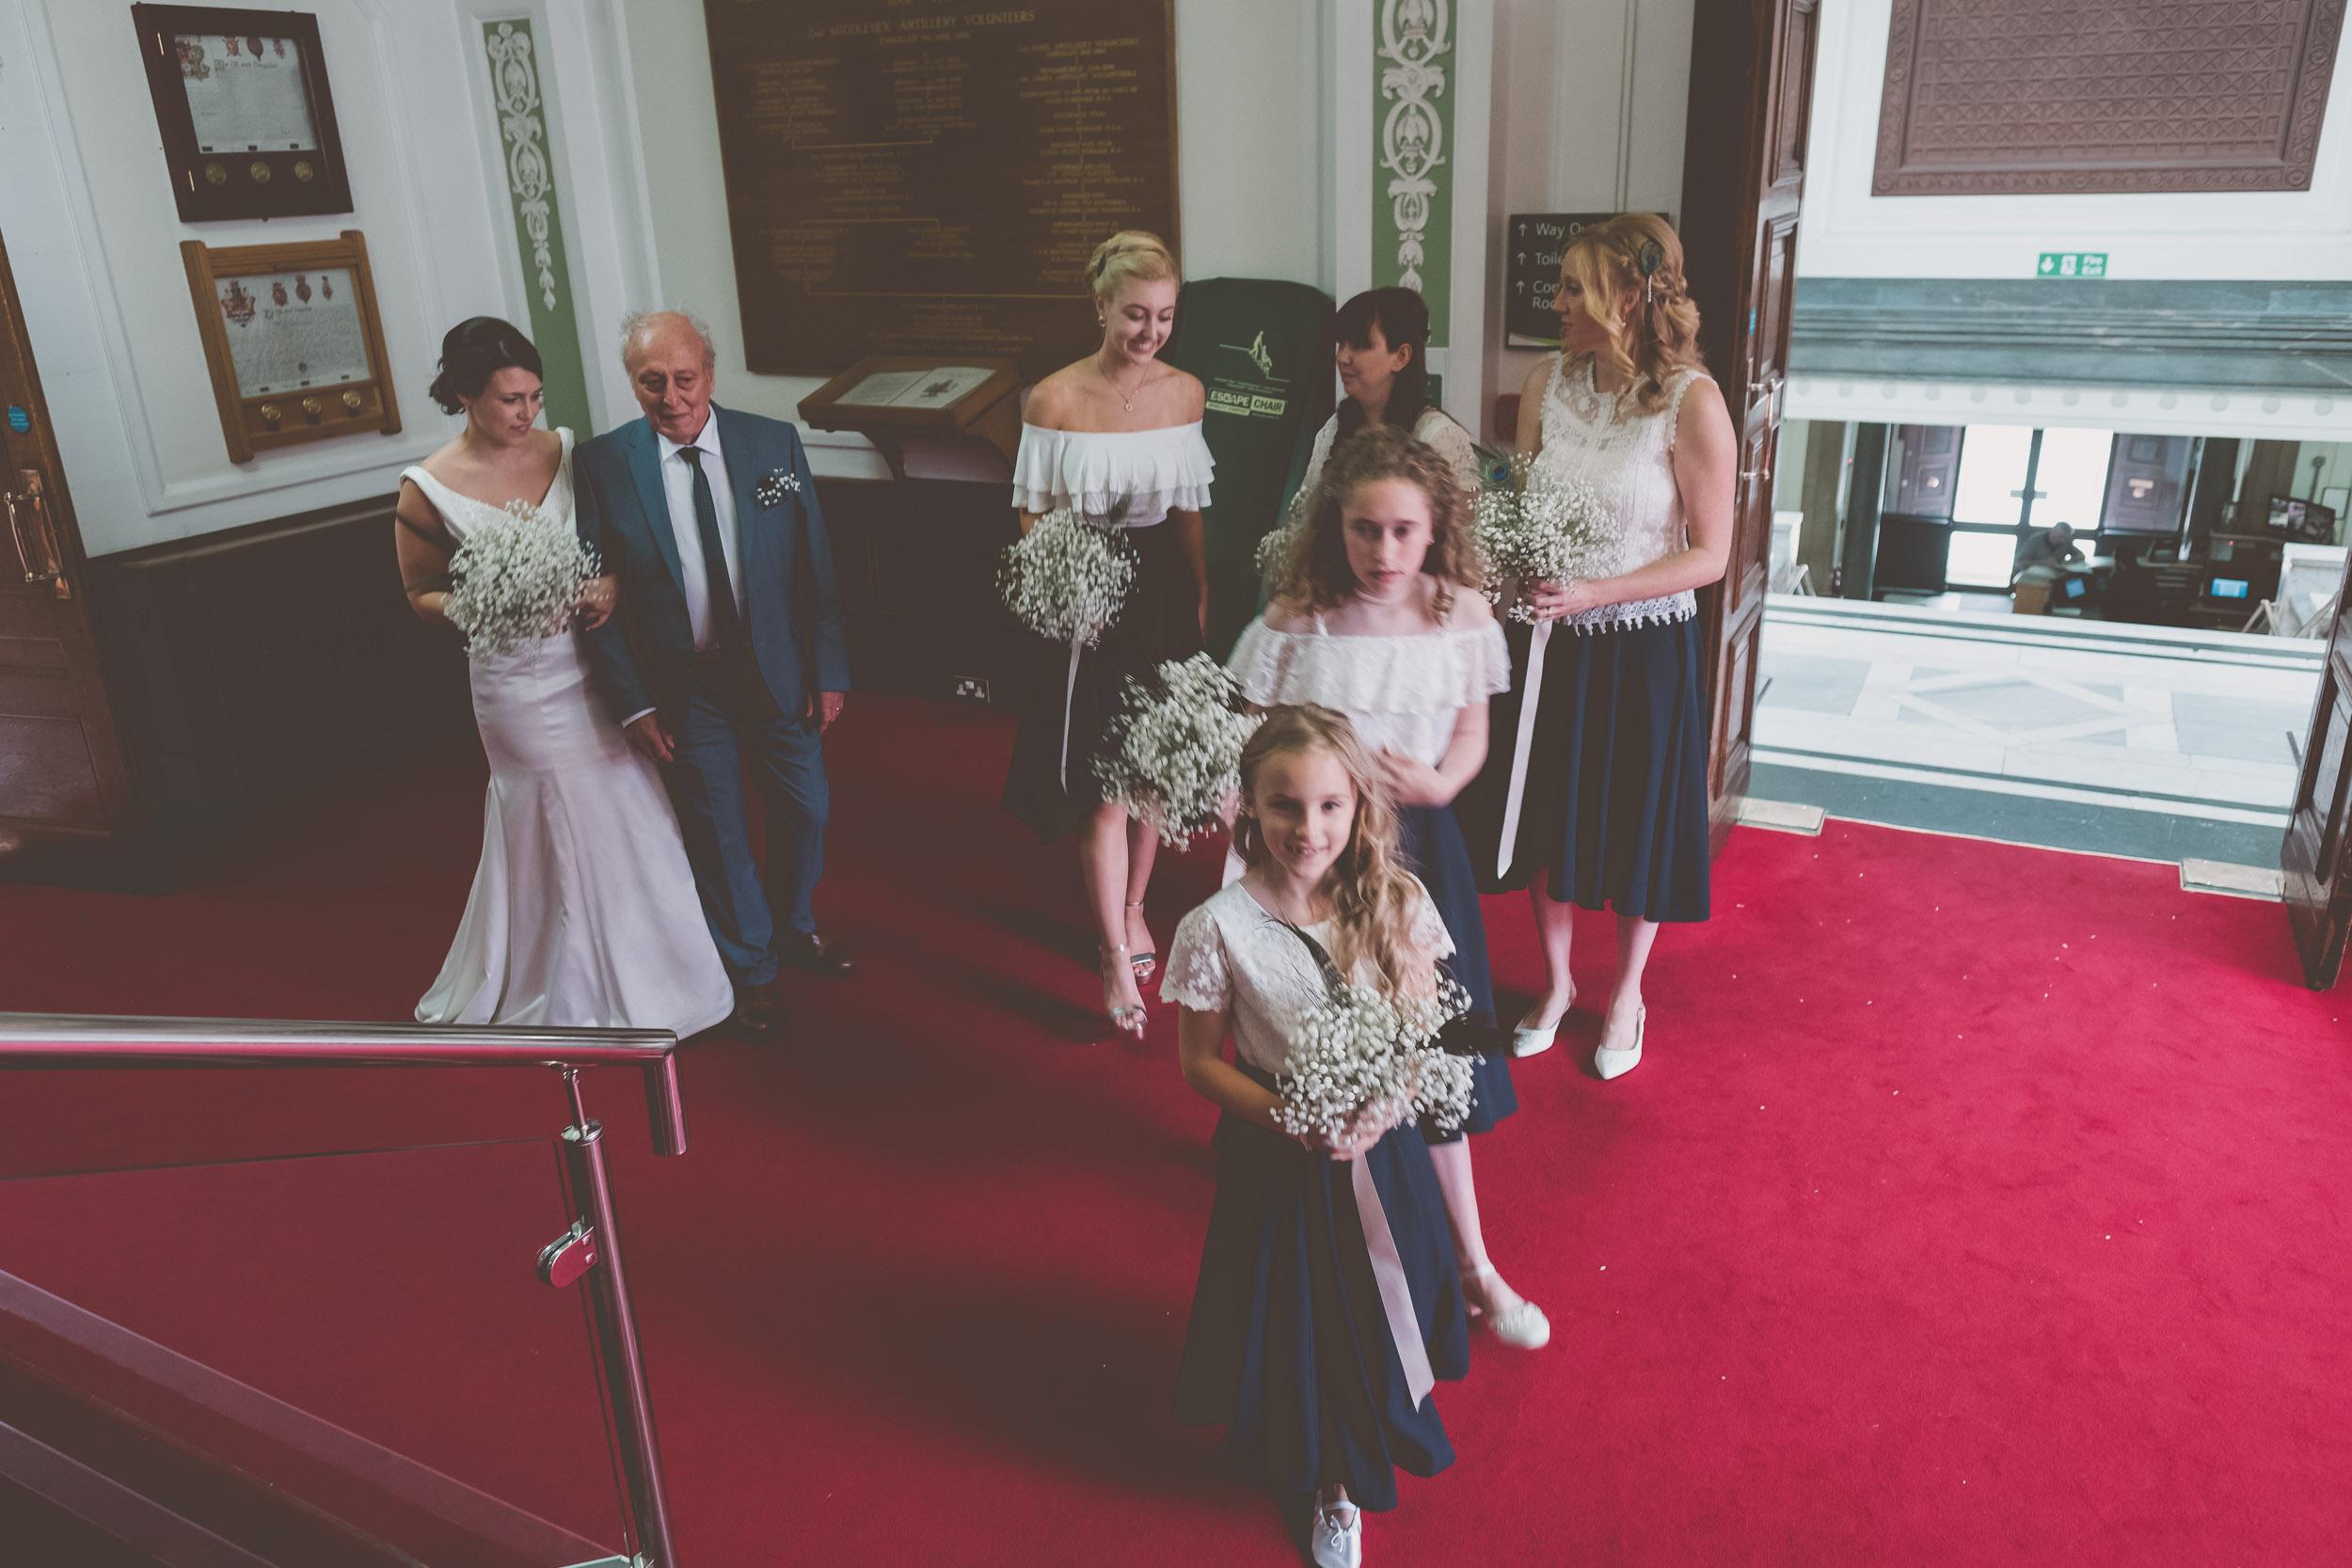 islington-town-hall-4th-floor-studios-wedding042.jpg